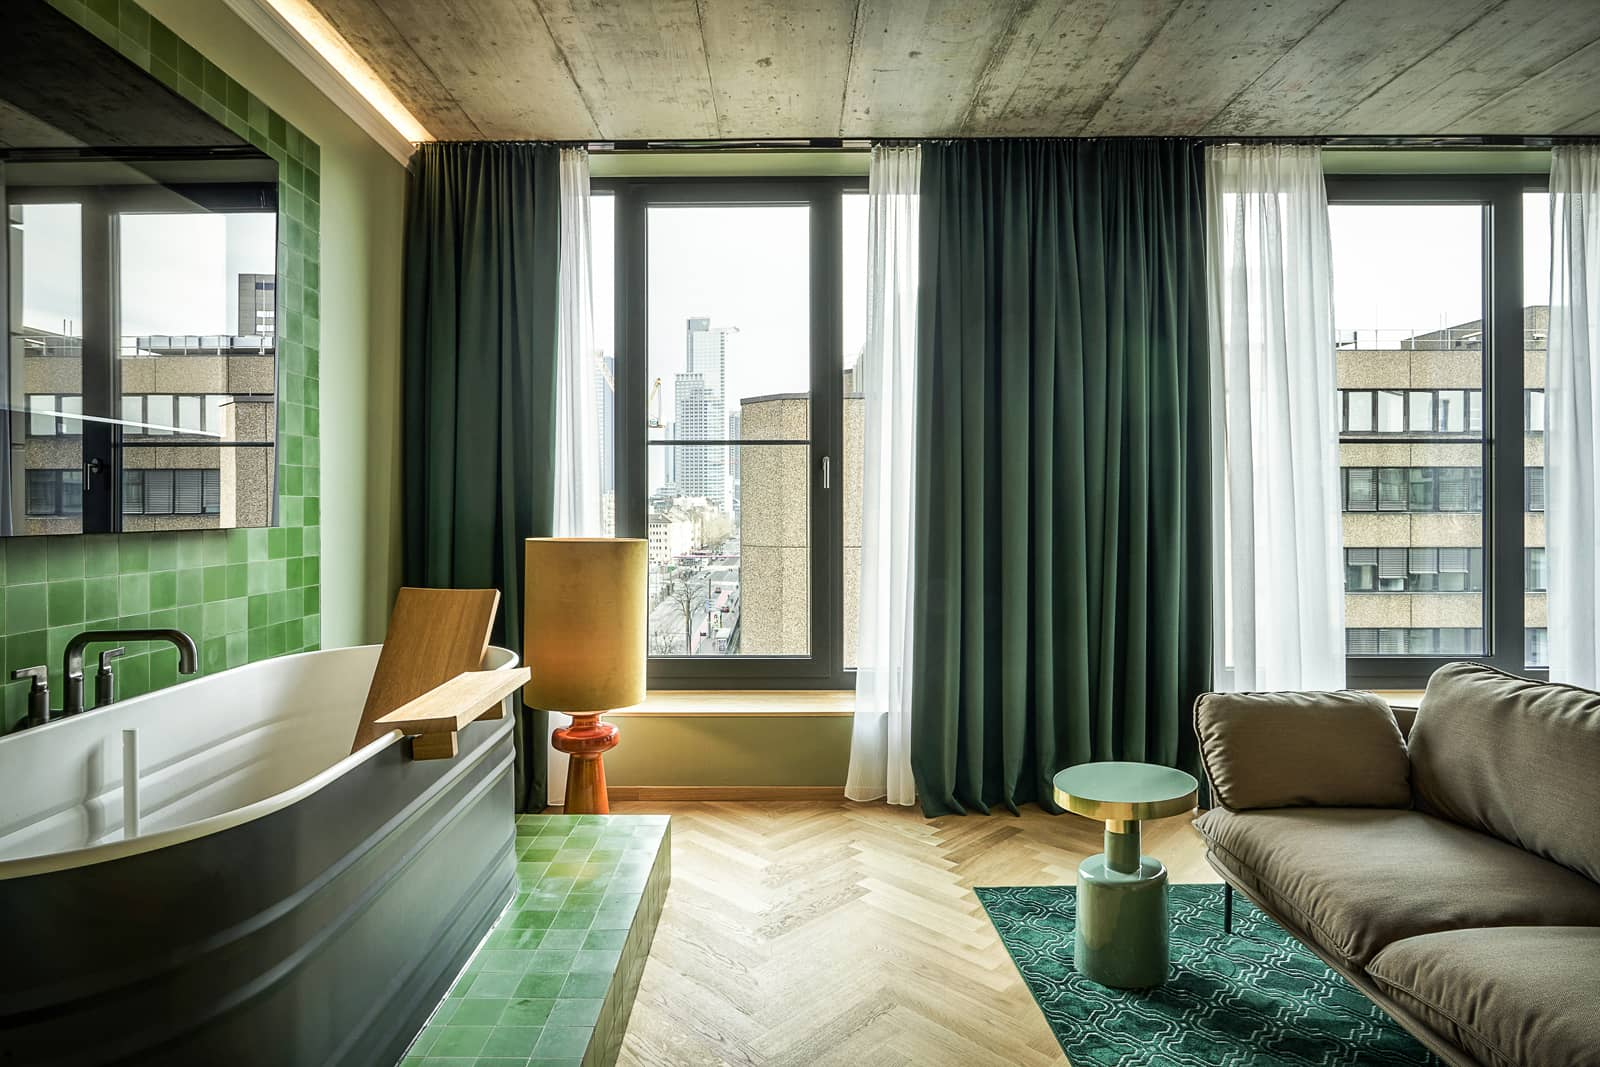 zementfliesen-terrazzofliesen-kreidefarbe-terrazzo-fugenlos-viaplatten-053-022-barwand-02